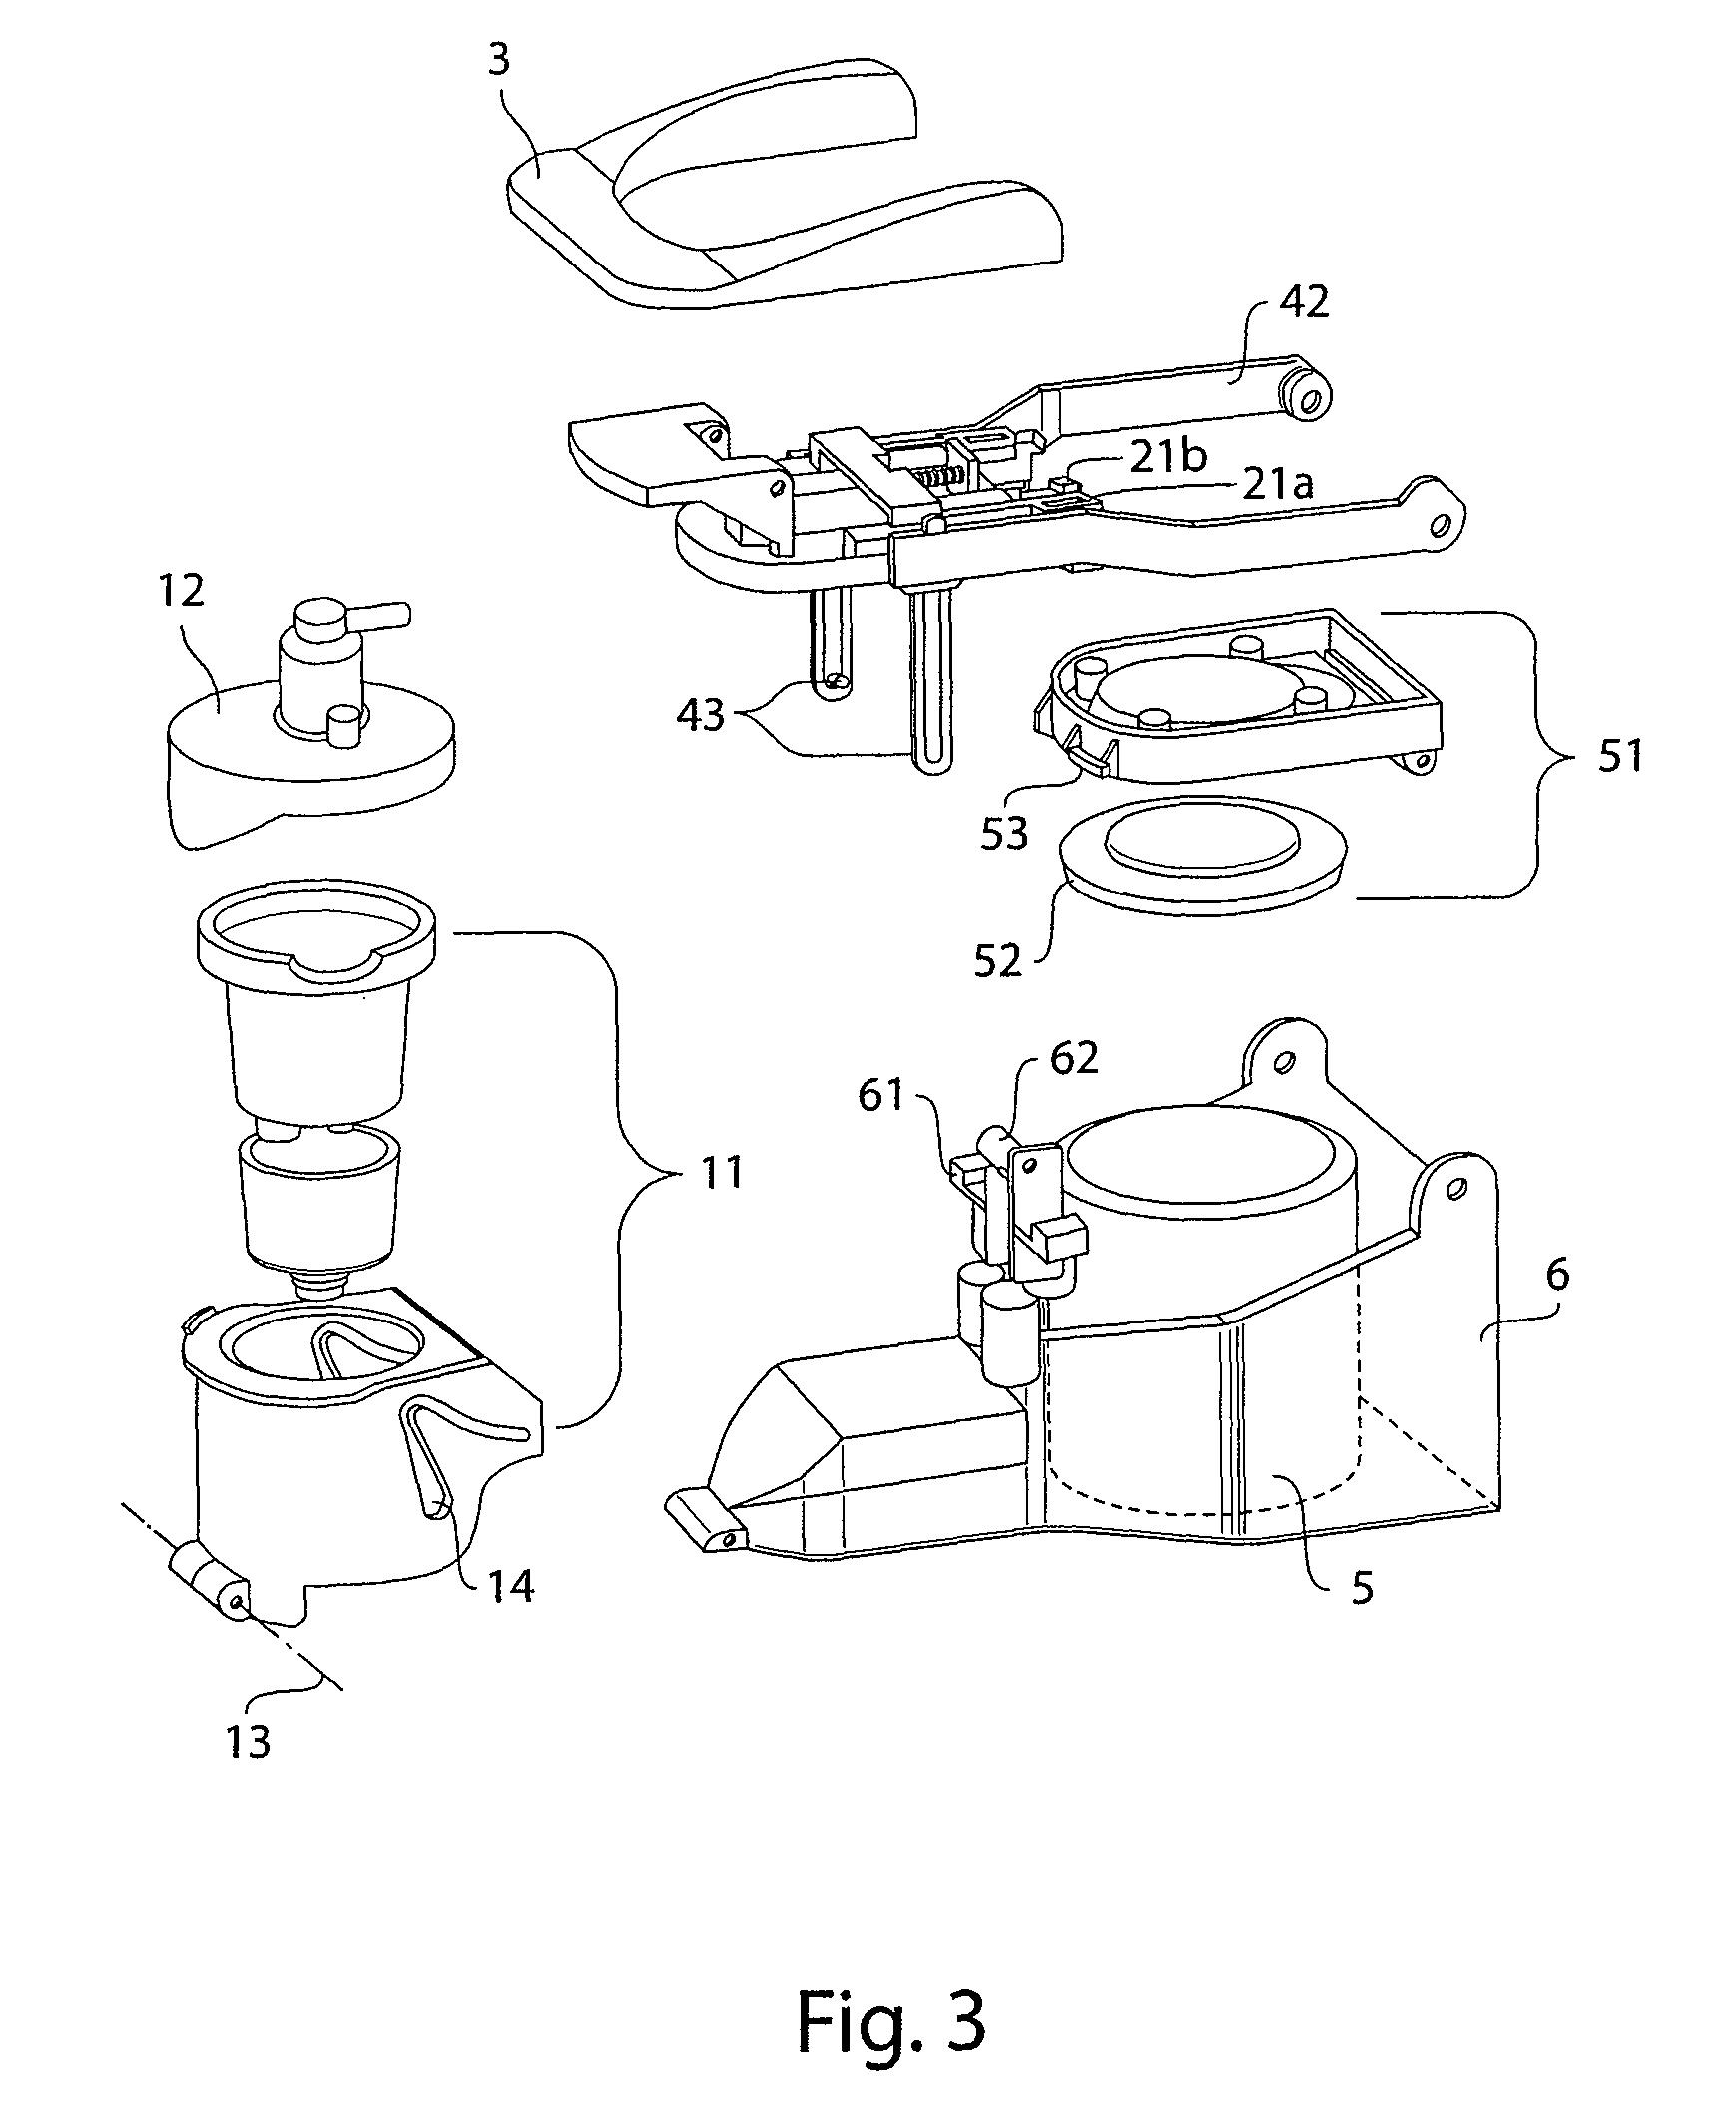 keurig 2 0 parts diagram schematic